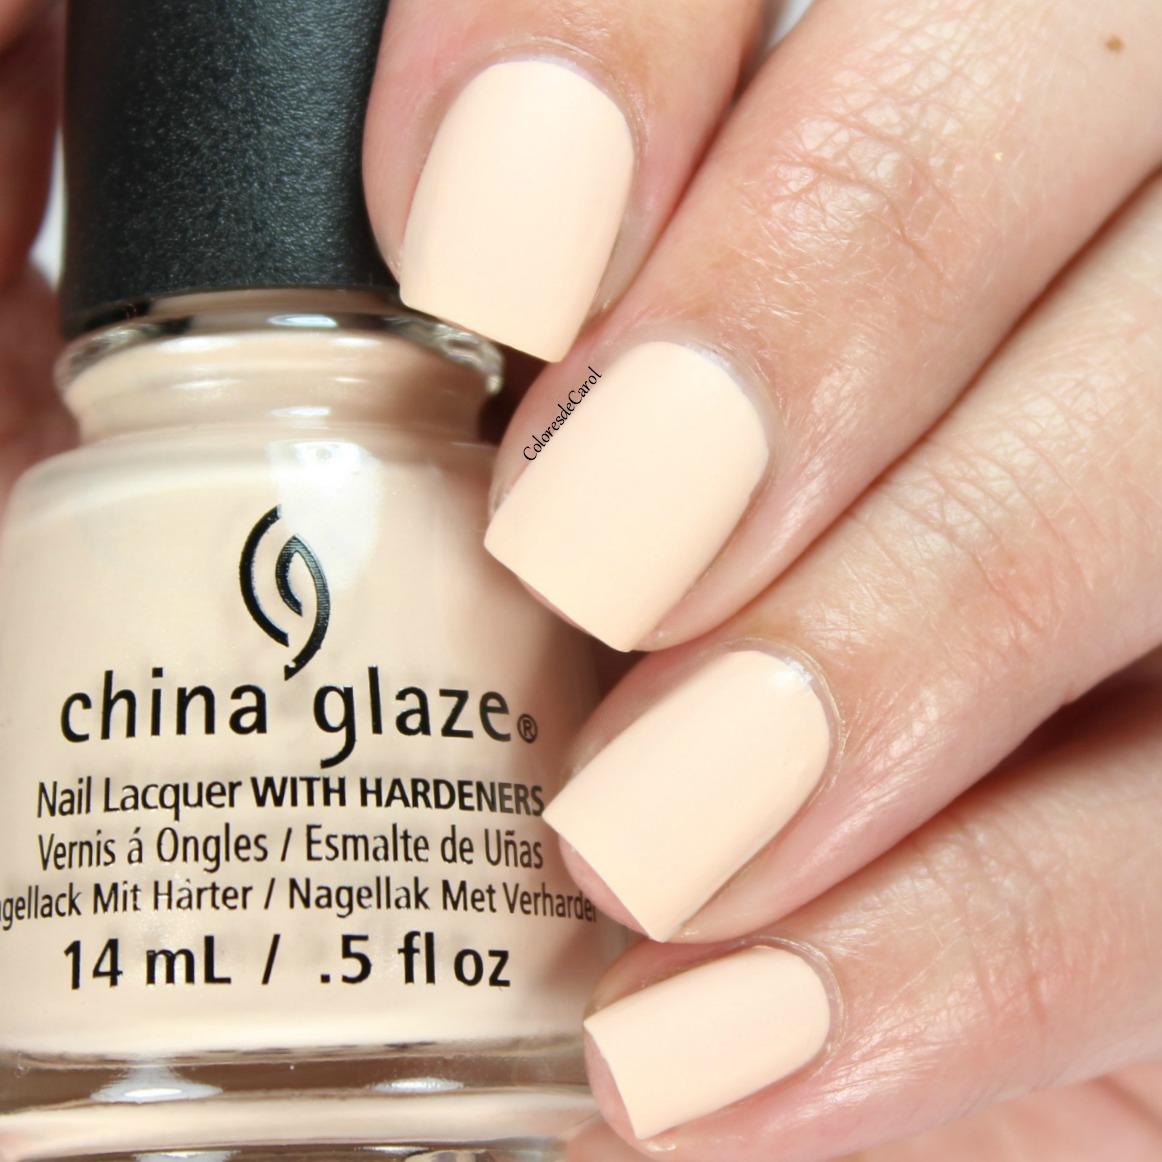 China Glaze Nail Polish Dries Matte- HireAbility